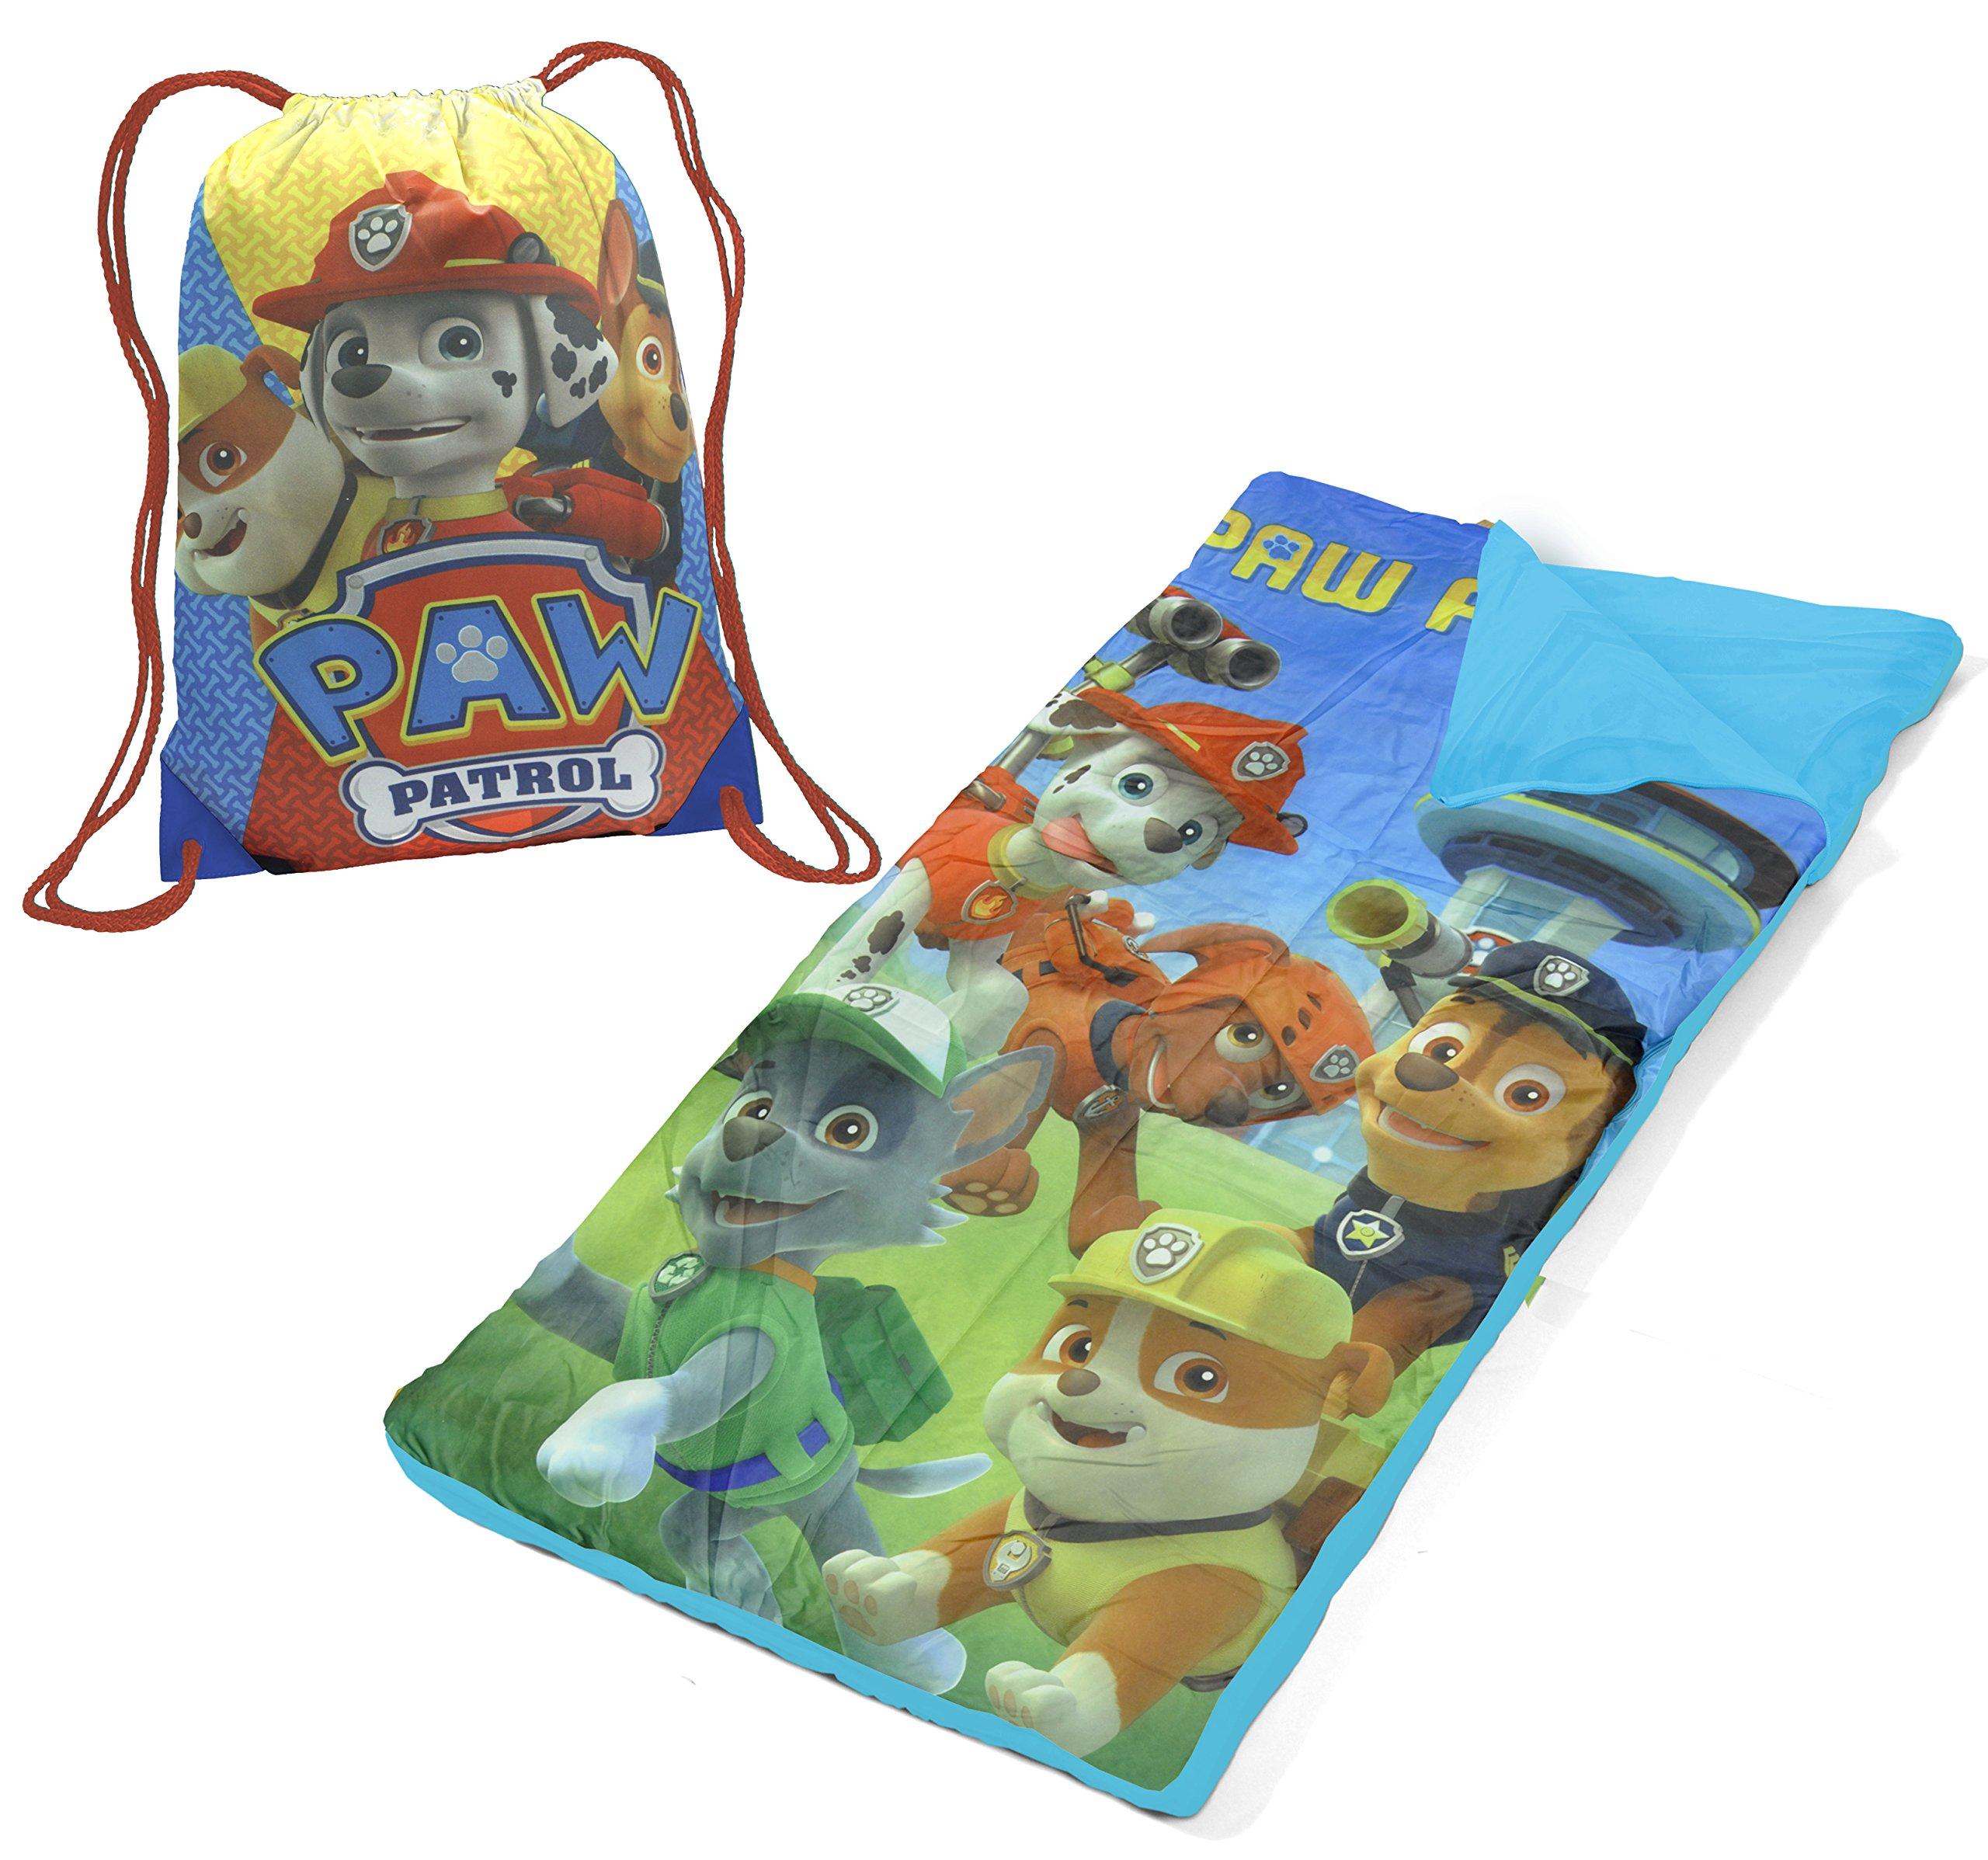 Nickelodeon Paw Patrol Drawstring Bag with Sleeping Sack by Nickelodeon